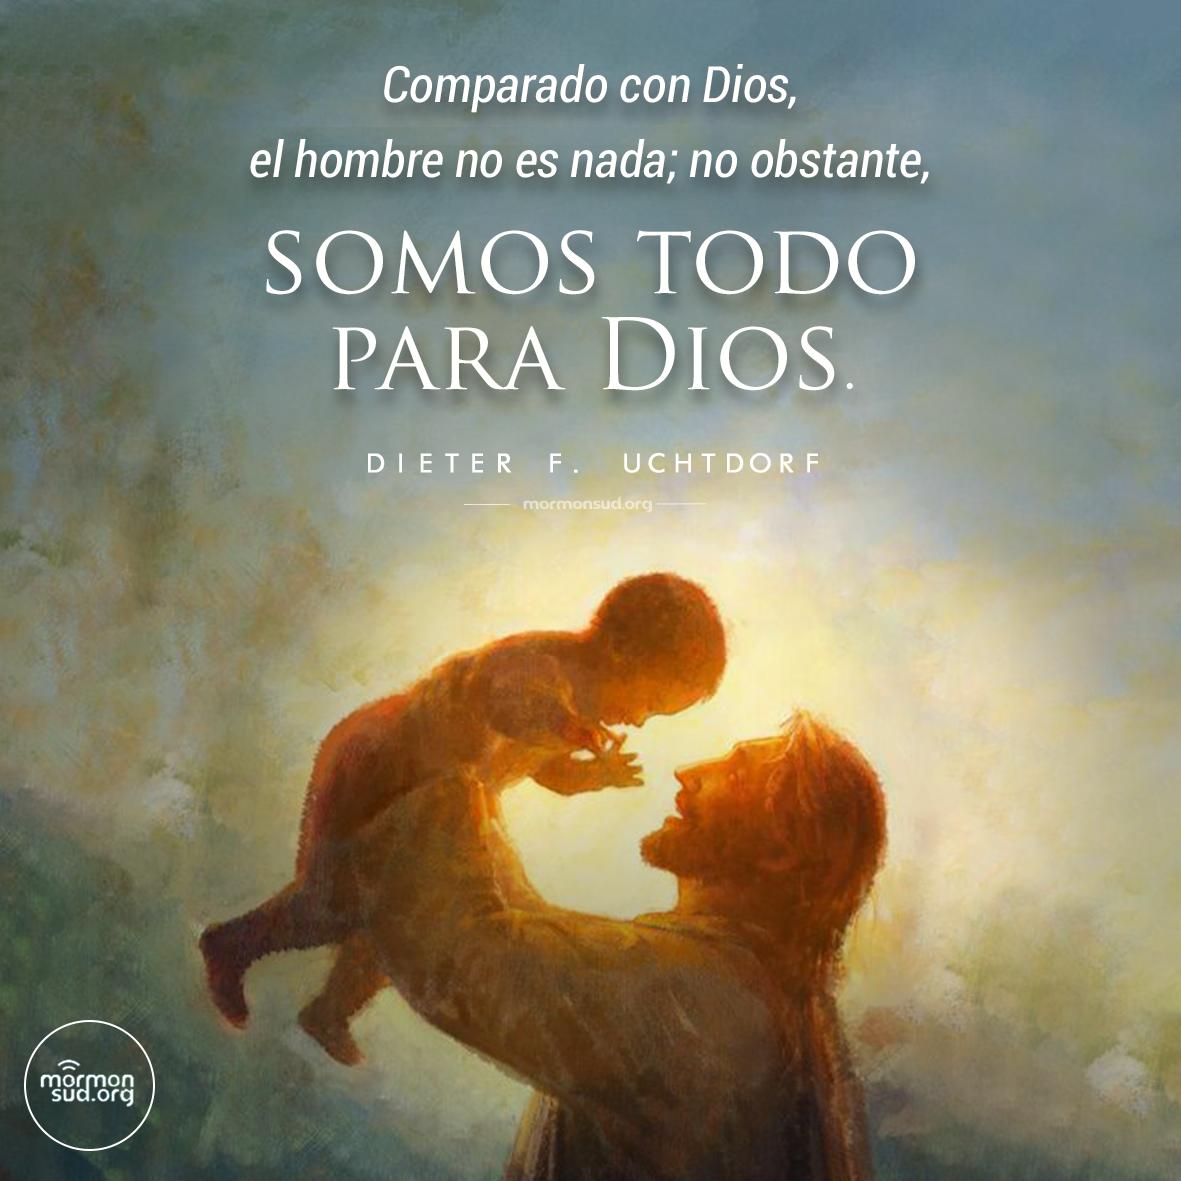 Somos Todos Para Dios Jesucristo Citas Mormonsud